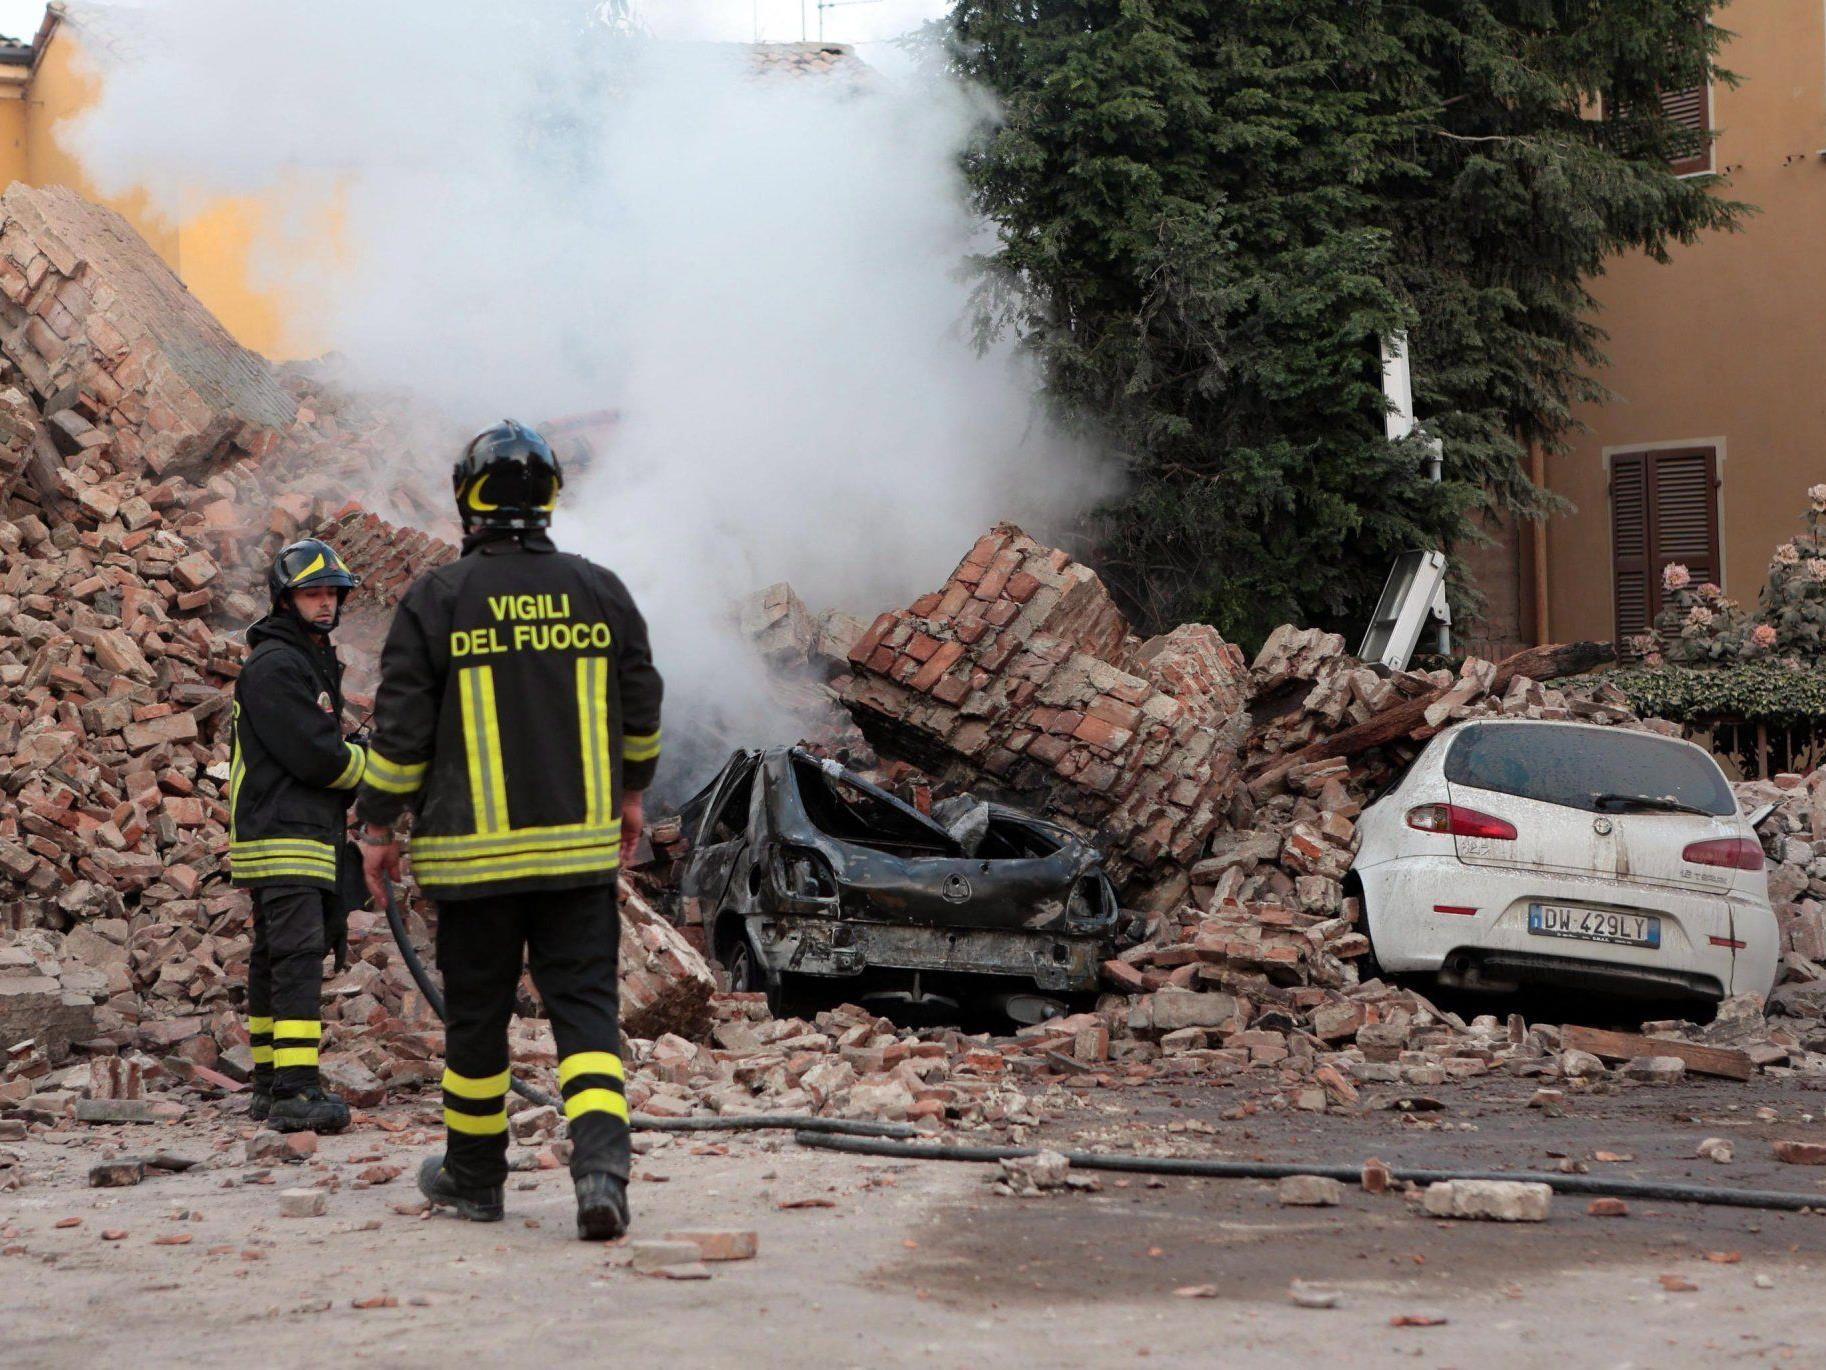 Bilder der Zerstörung nach dem verheerenden Beben in Norditalien.